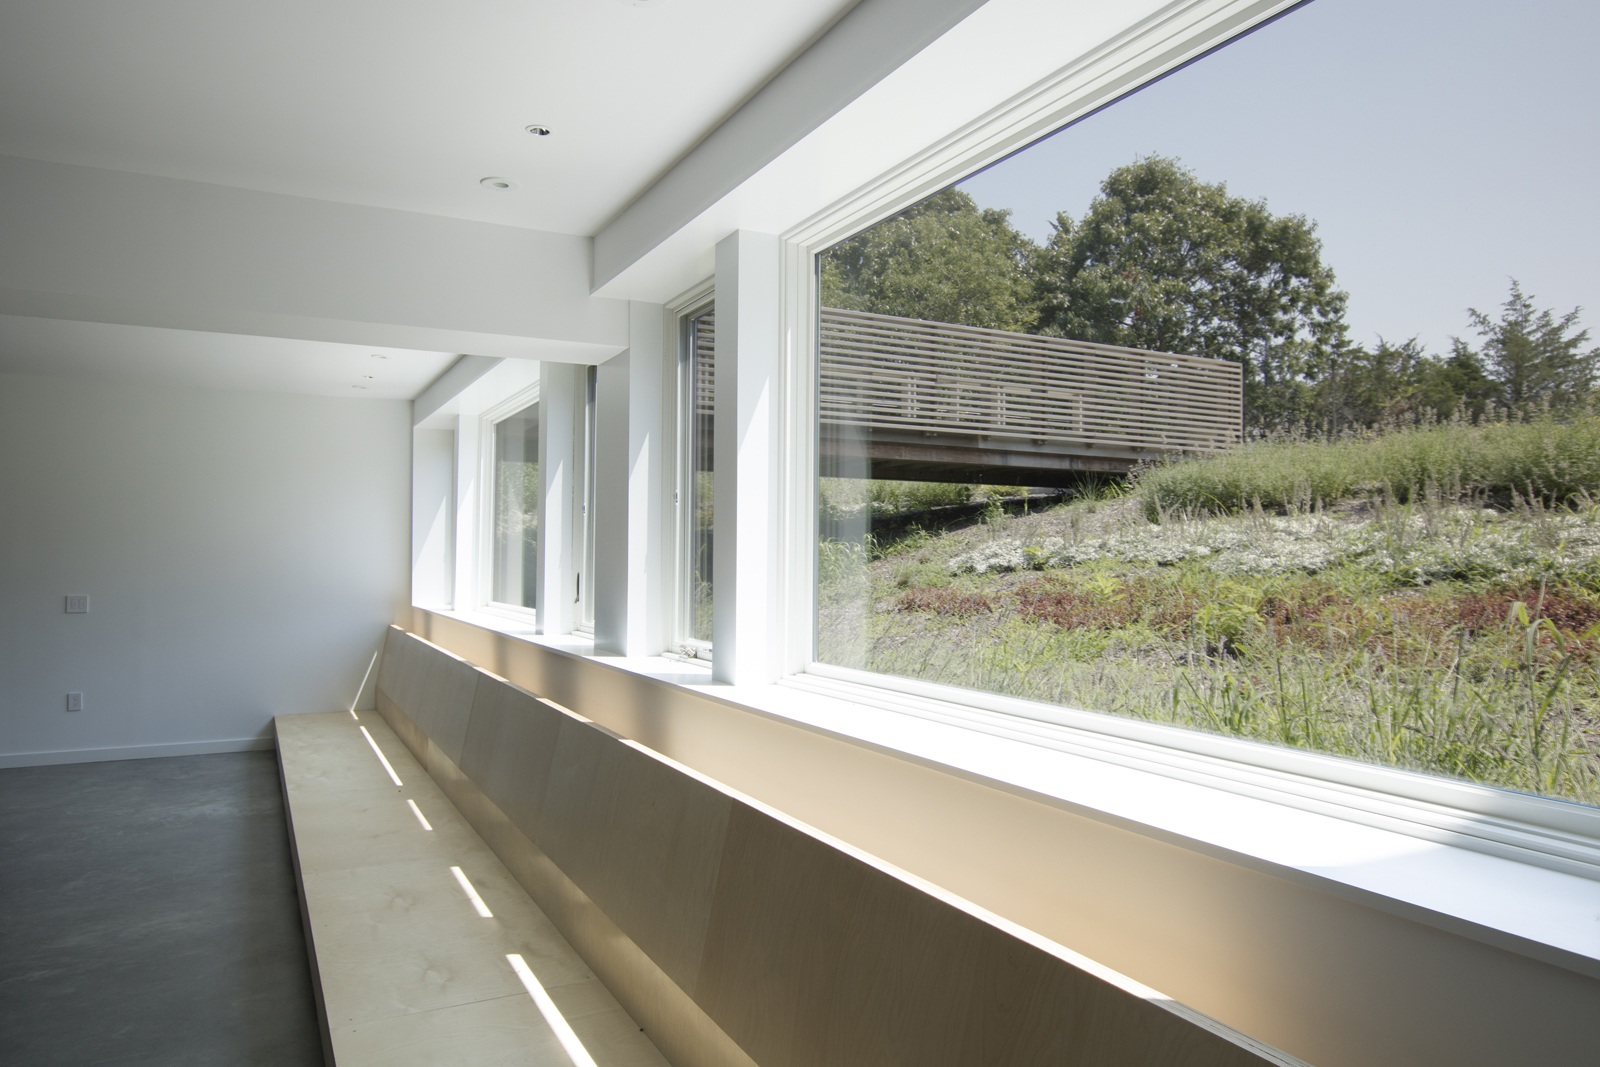 18-res4-resolution-4-architecture-modern-modular-house-prefab-home-north-fork-bluff-house-interior-basement.jpg